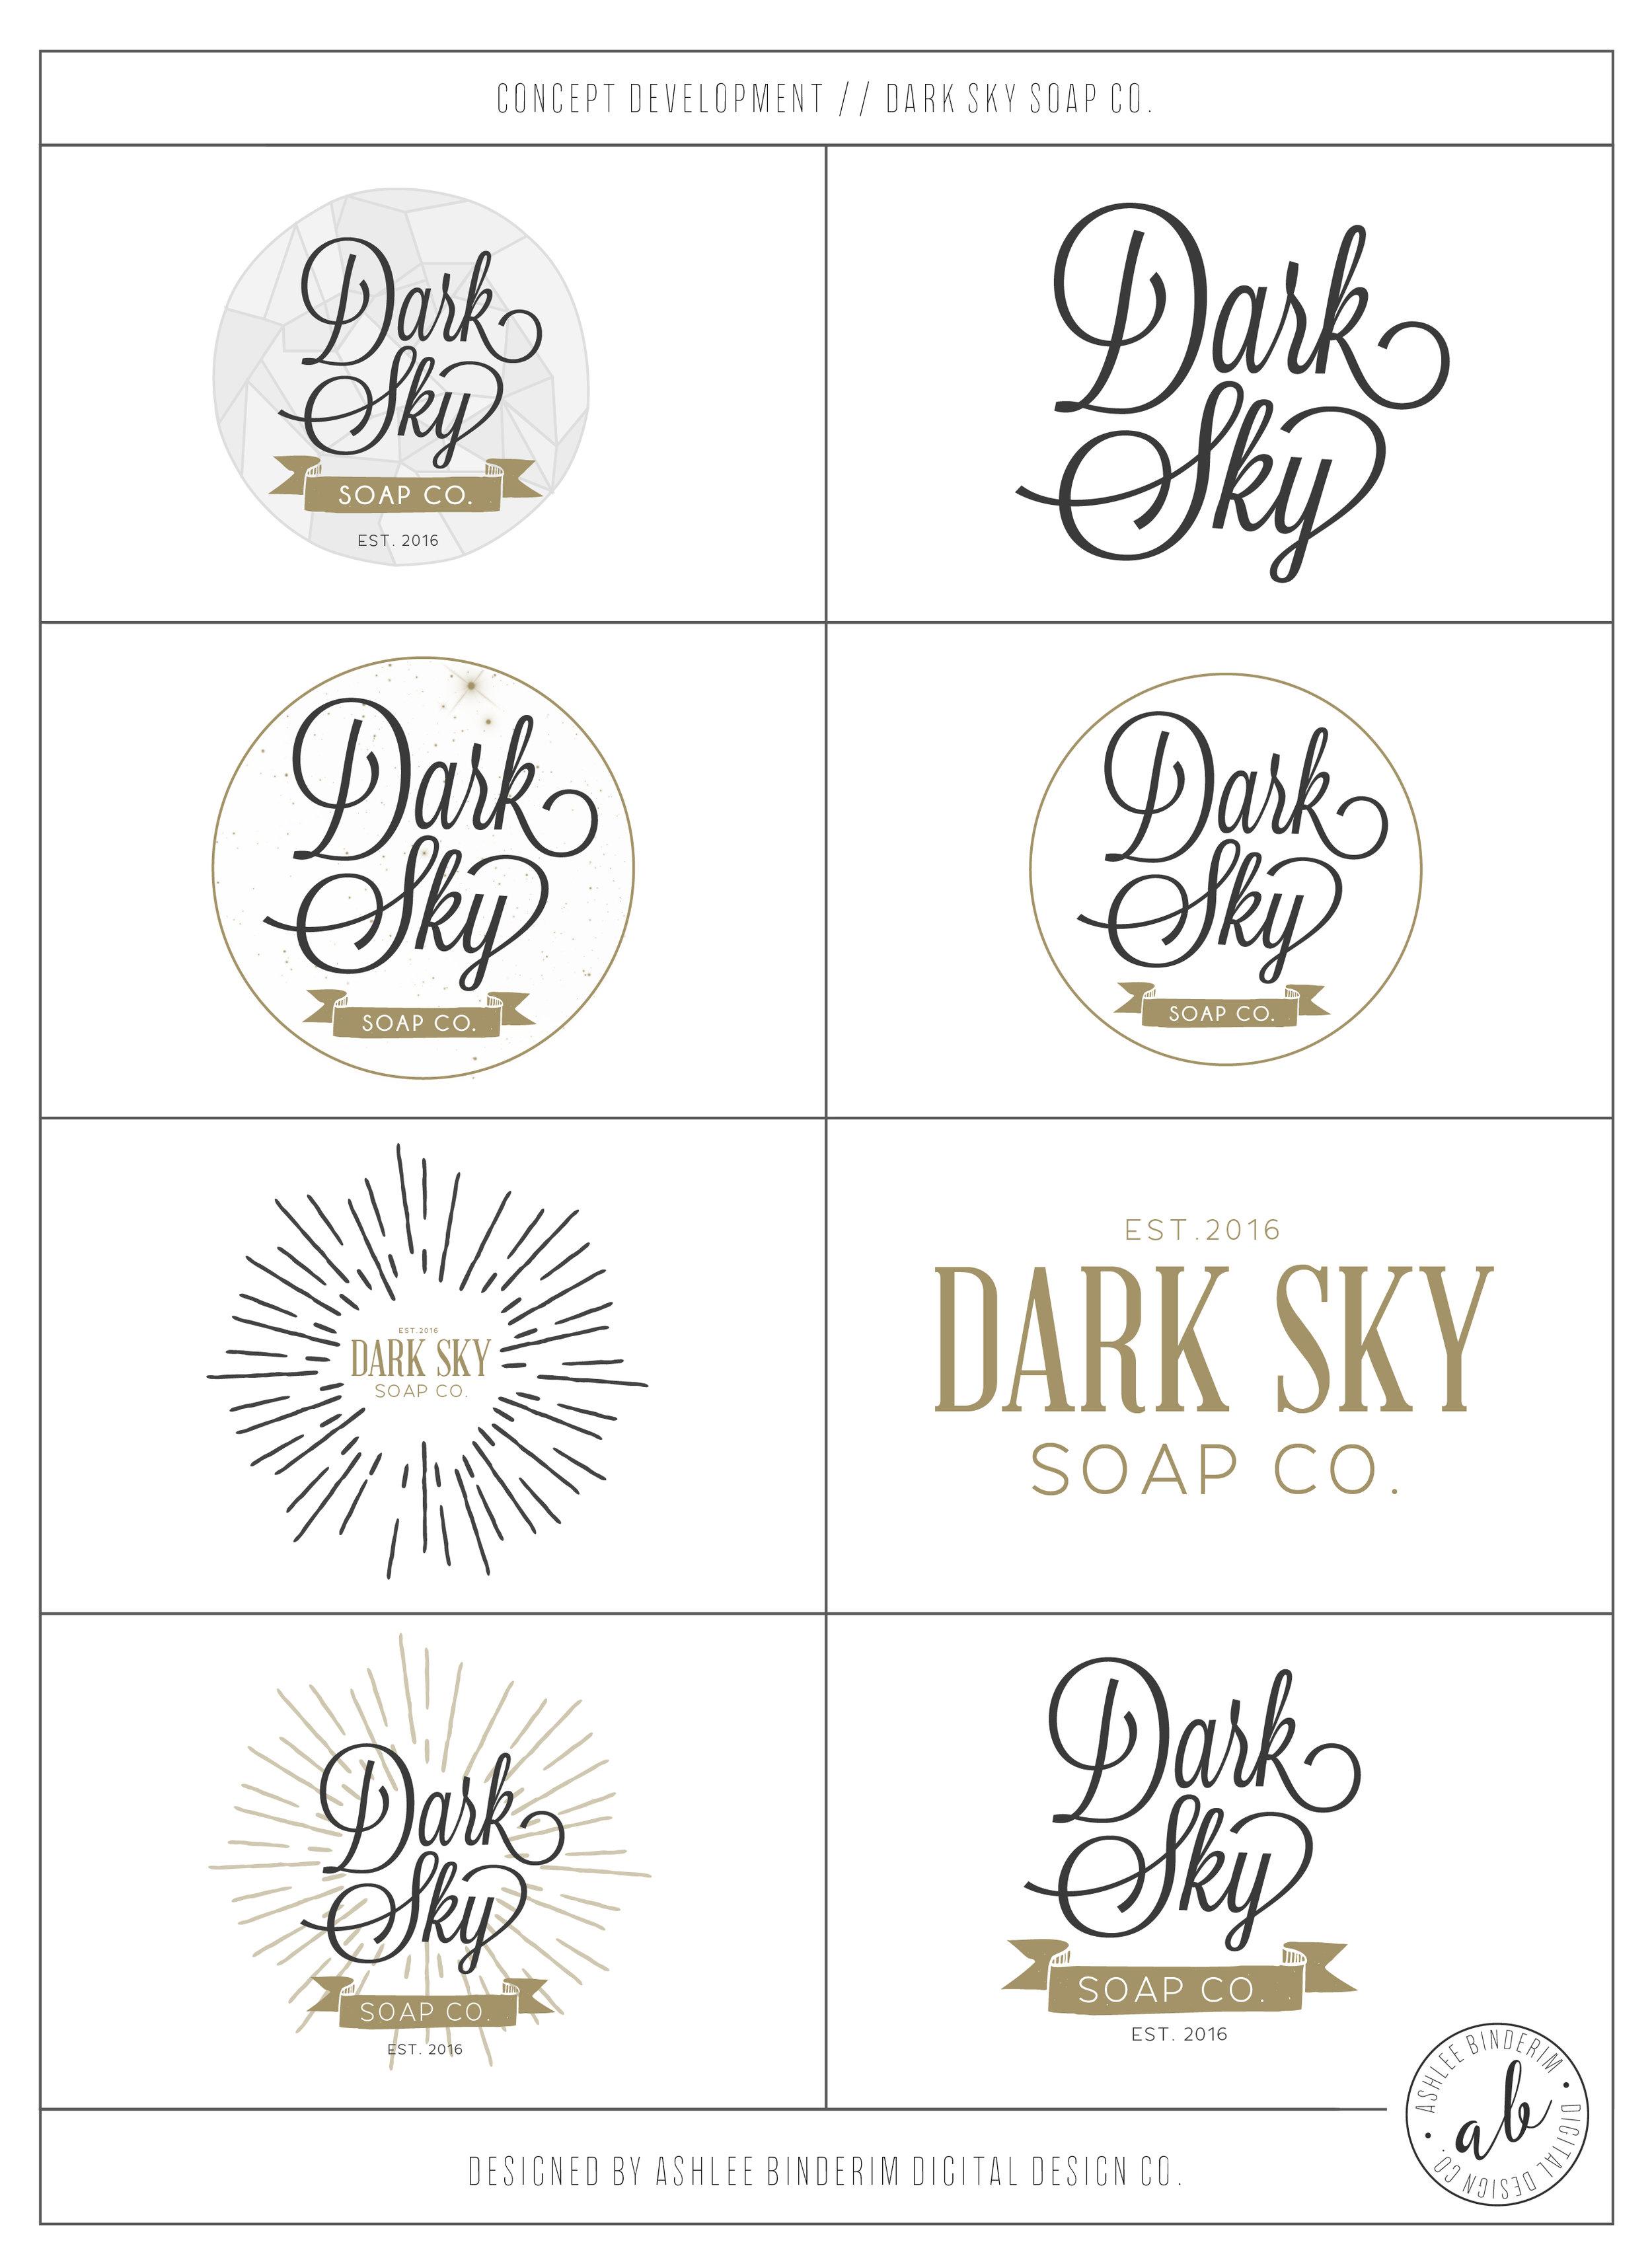 Dark Sky Soap Co. Concept Development